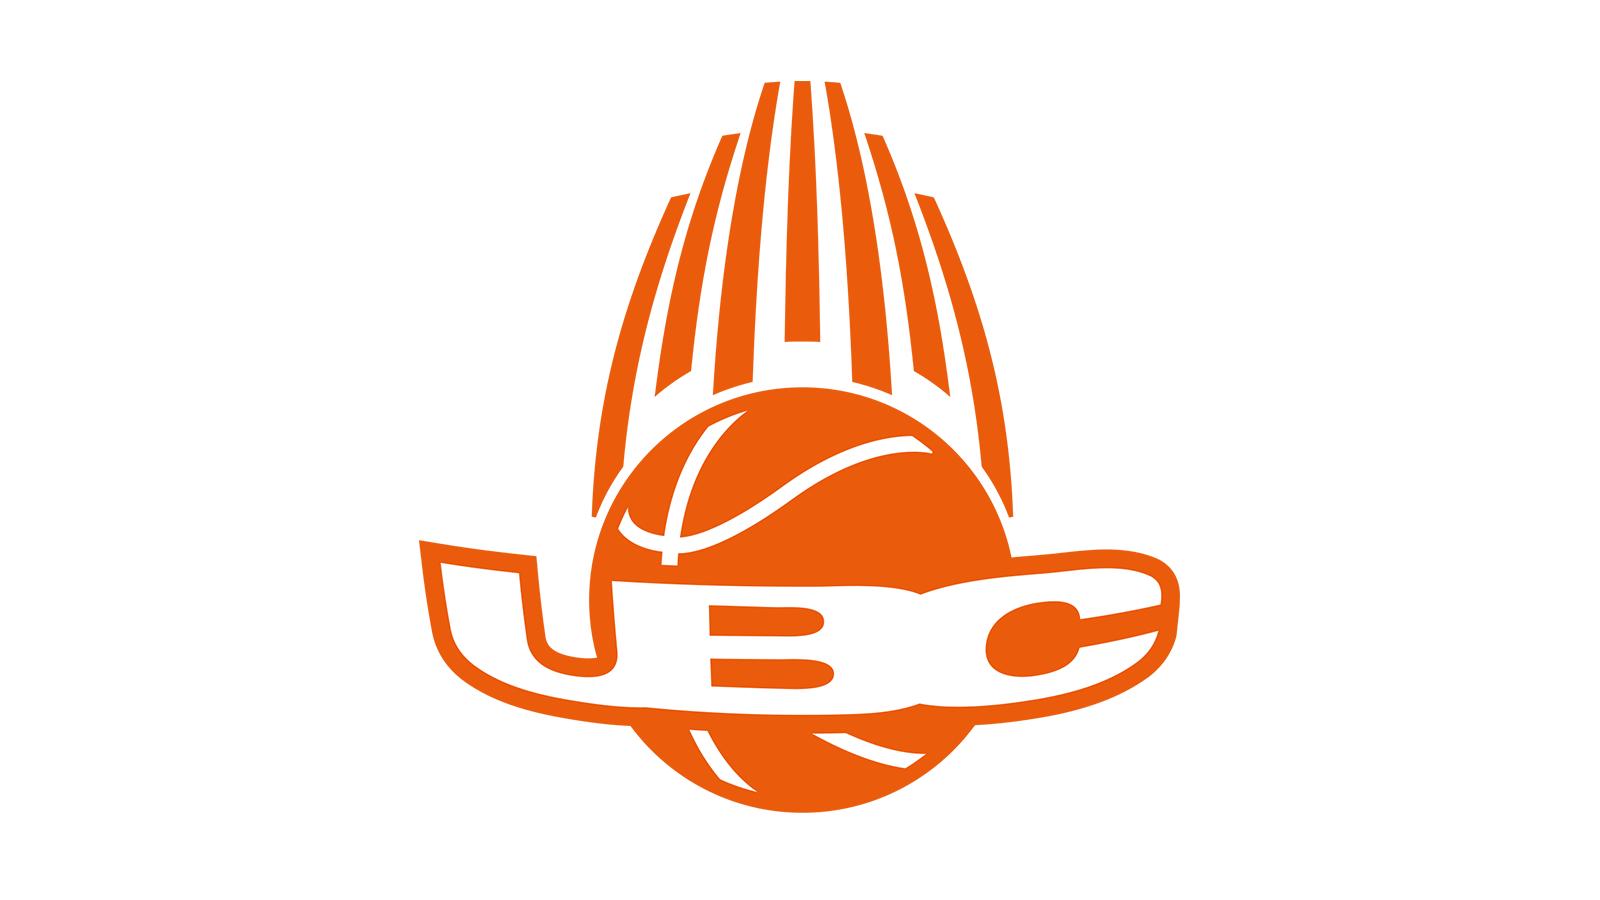 Logo_16x9_UBC-Münster_orange